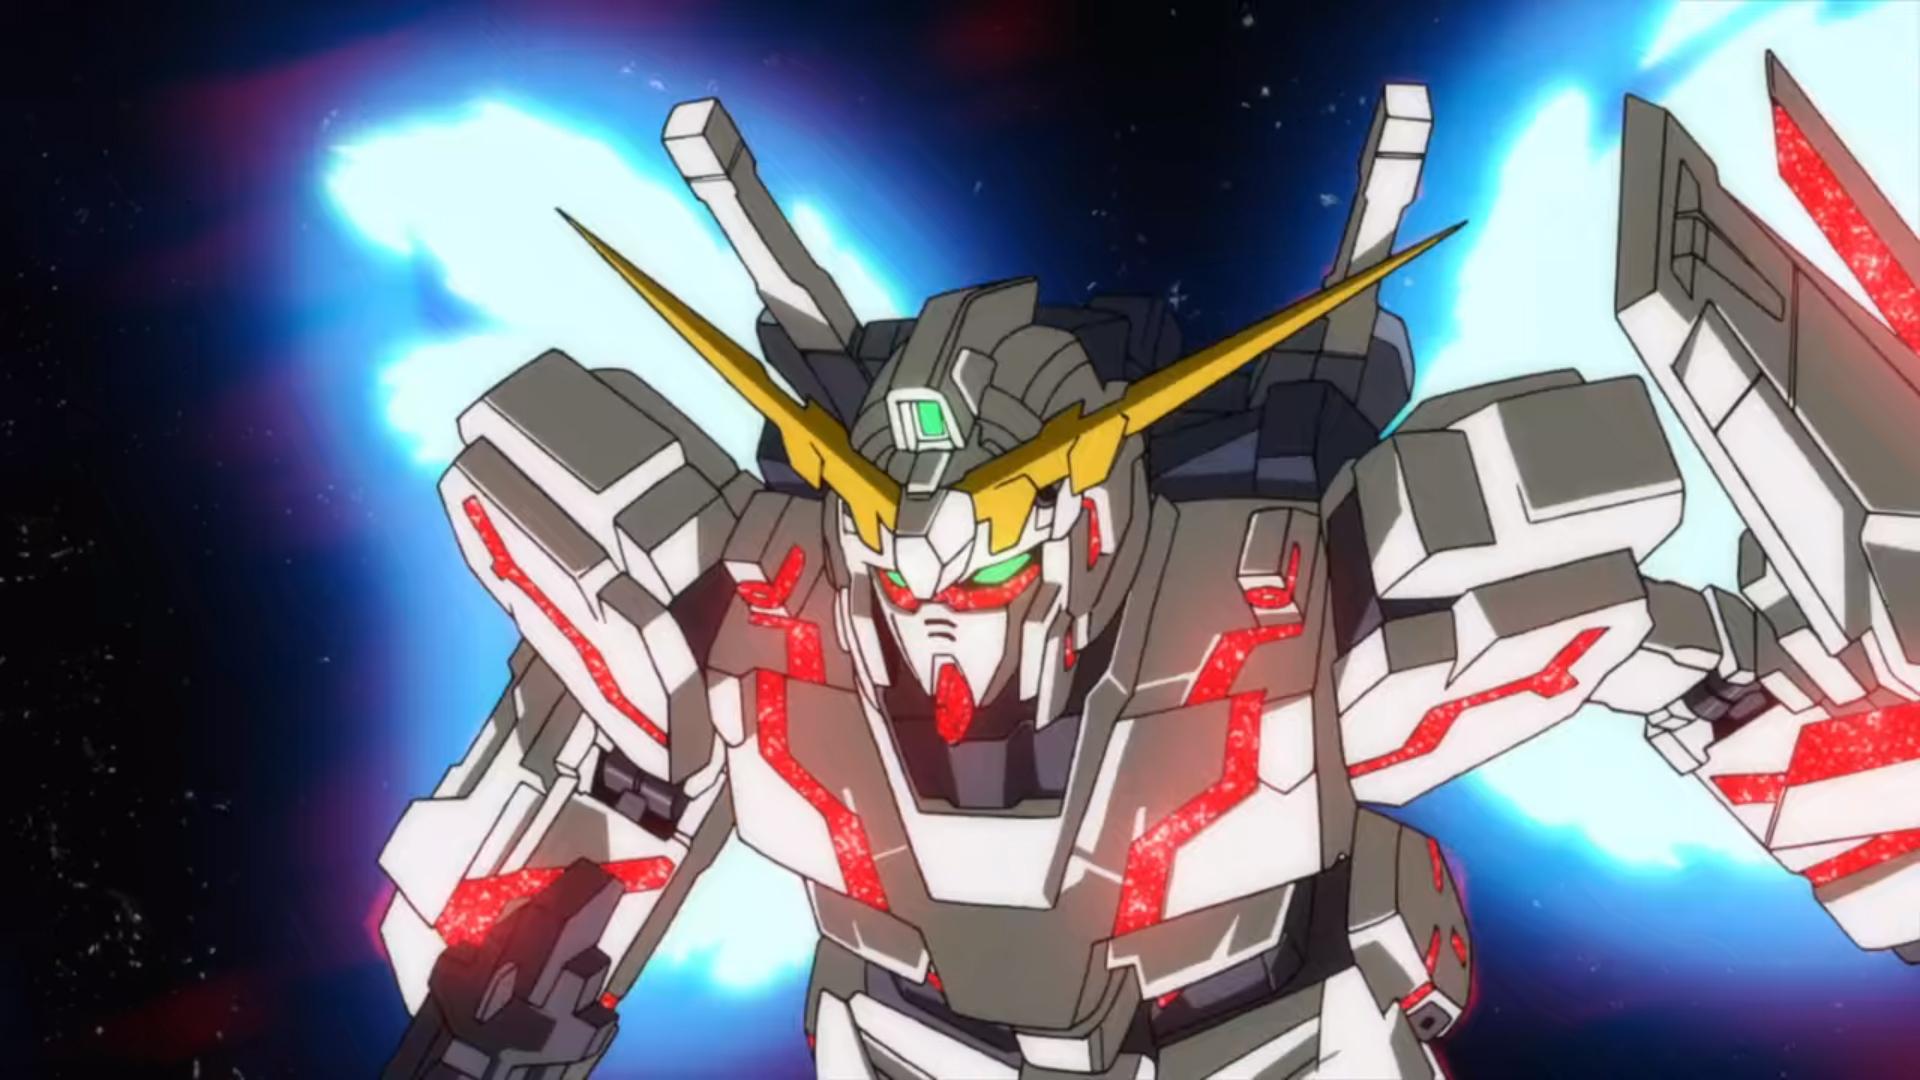 Crítica do Mobile Suit Gundam Unicorn 6